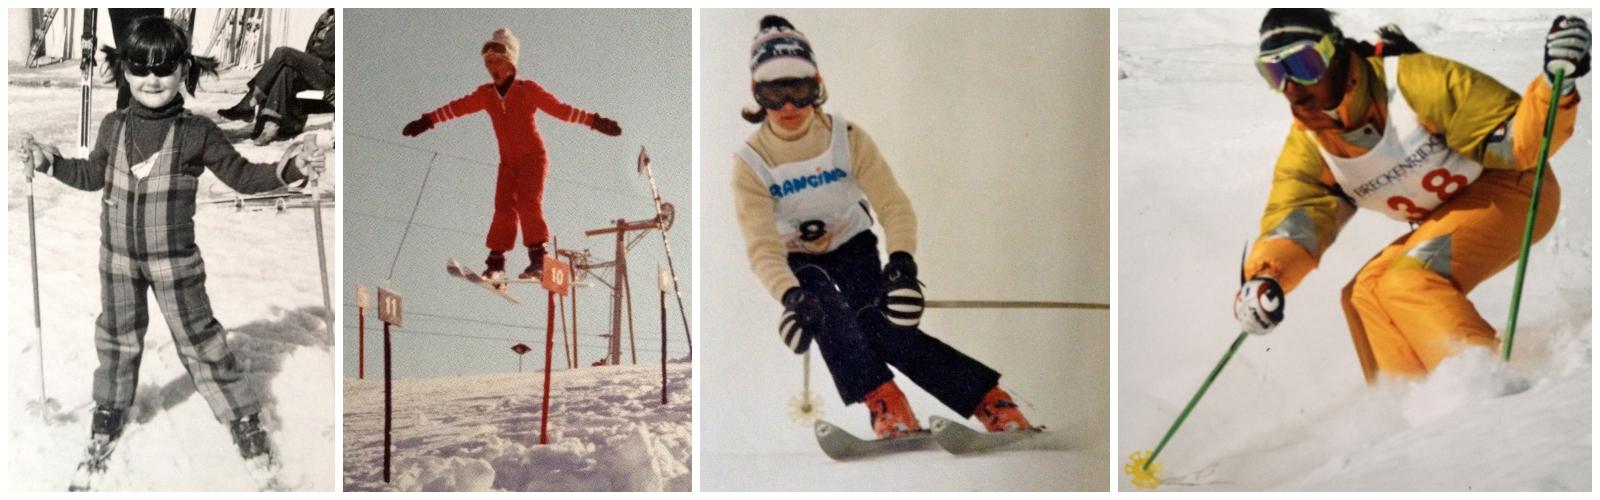 collage-ski-fanny